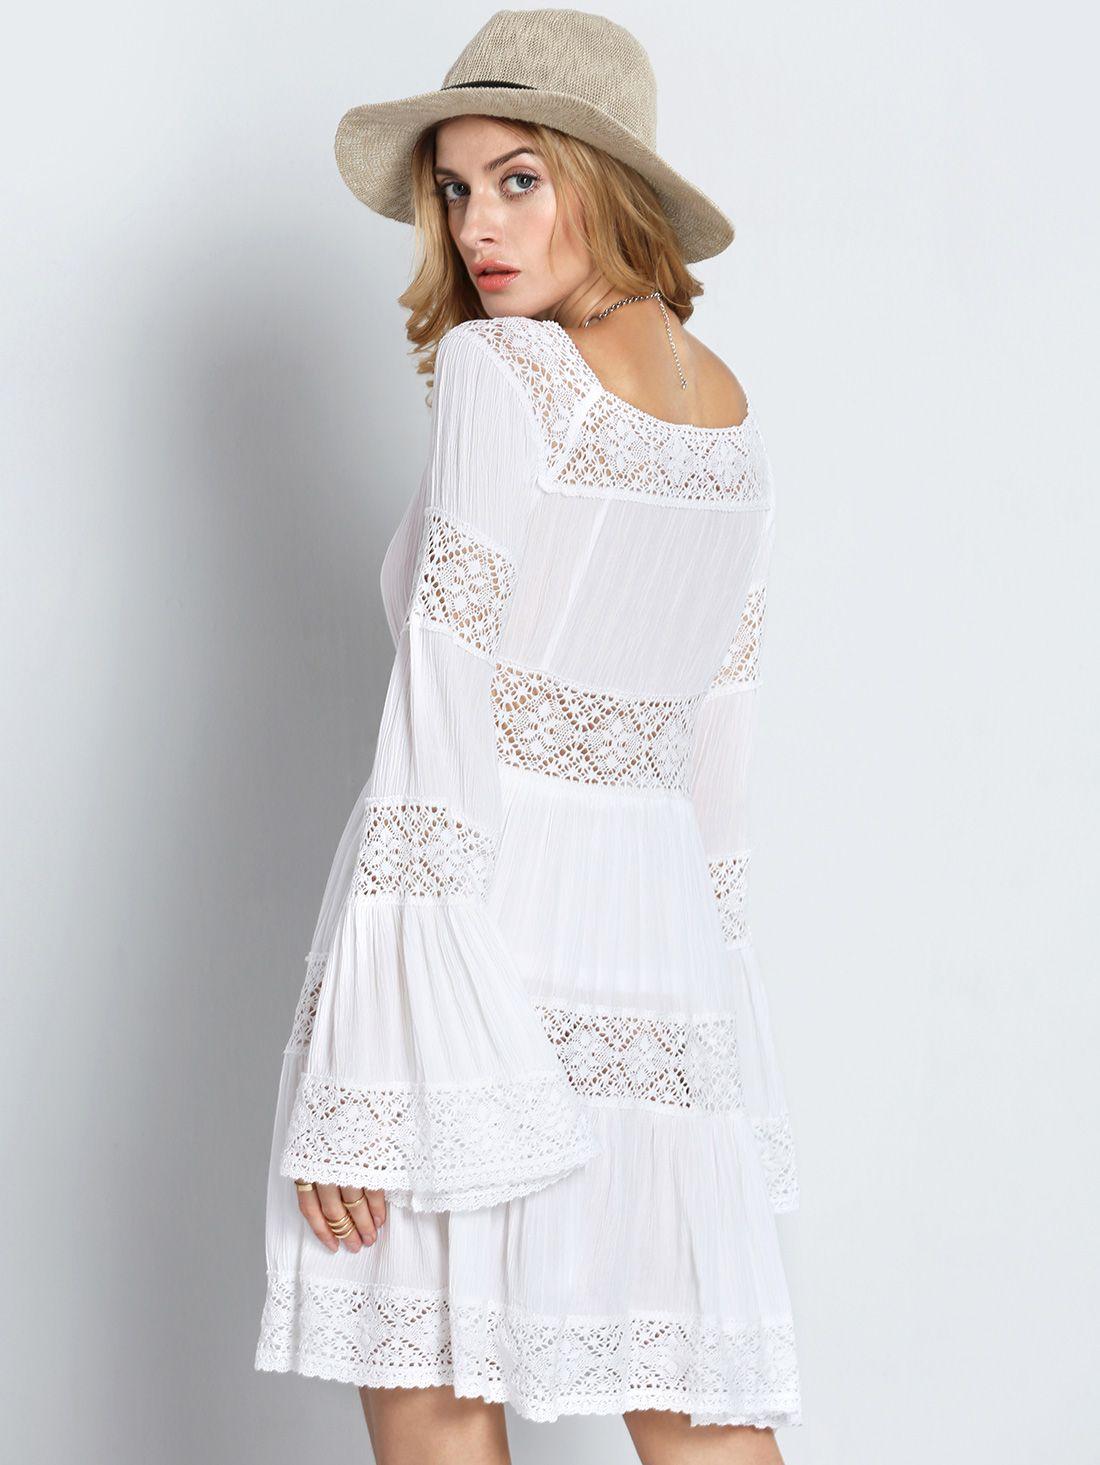 21+ White long sleeve boho dress info